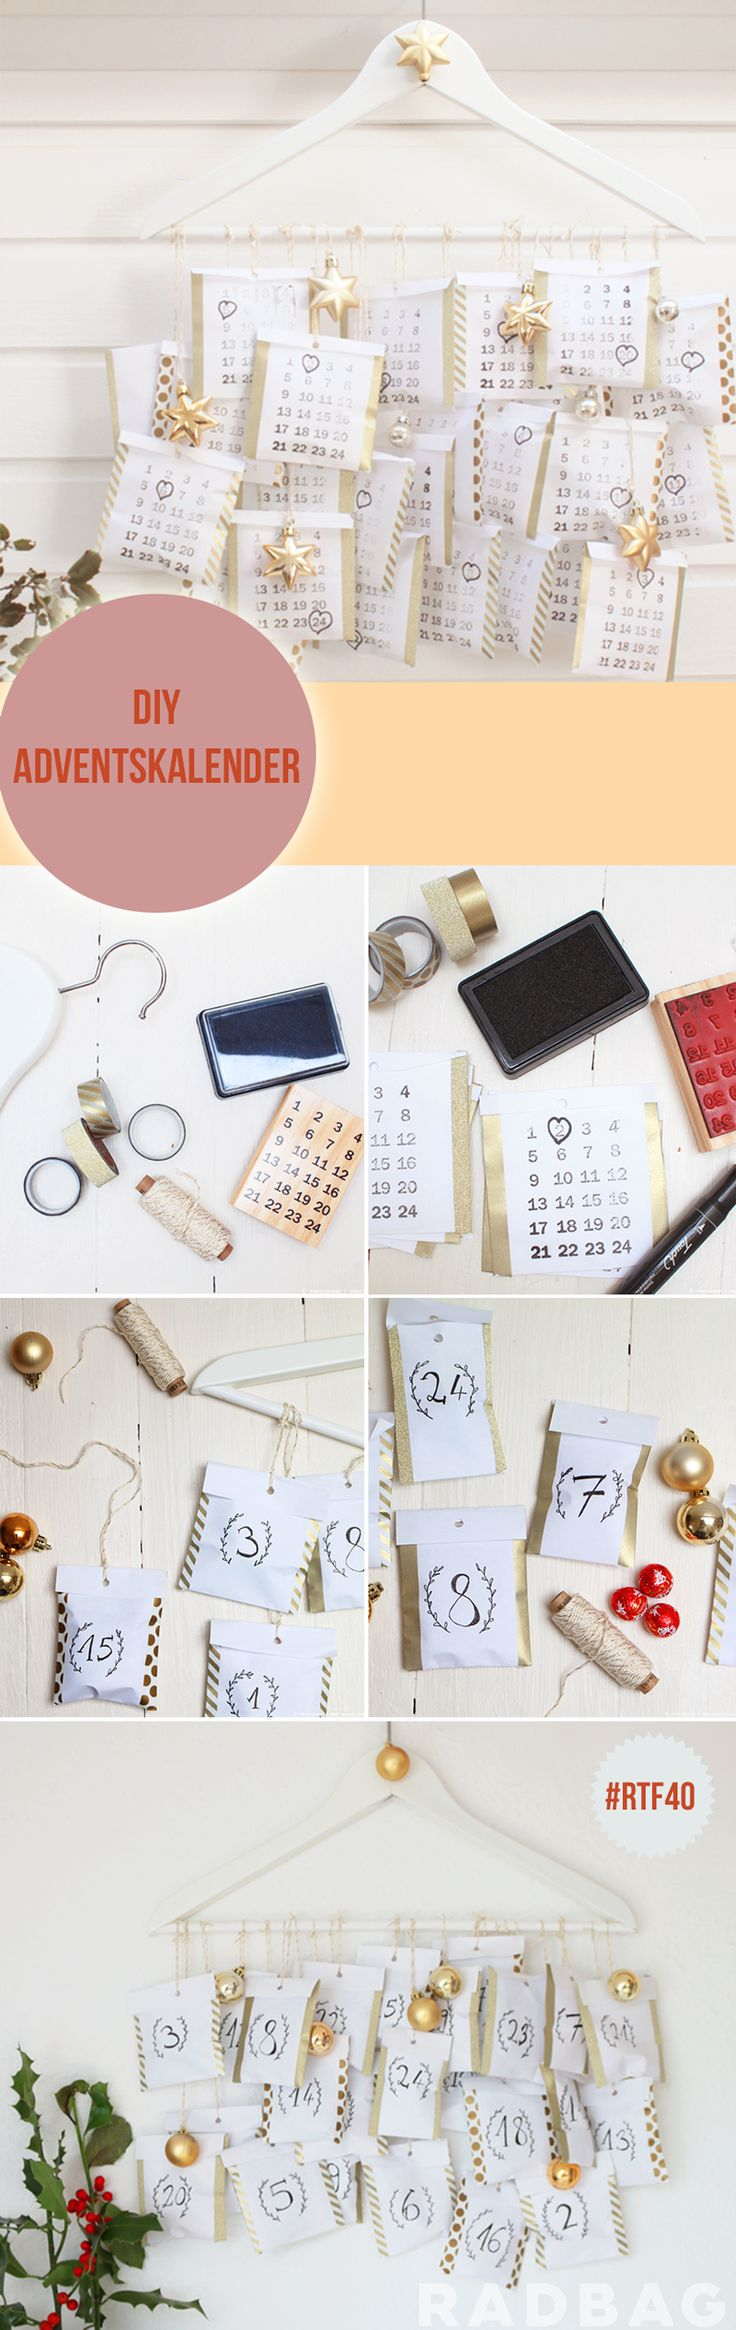 Adventskalender DIY | last minute geschenkideen advent weihnachtsbastelideen basteln bastelideen kalender calendar